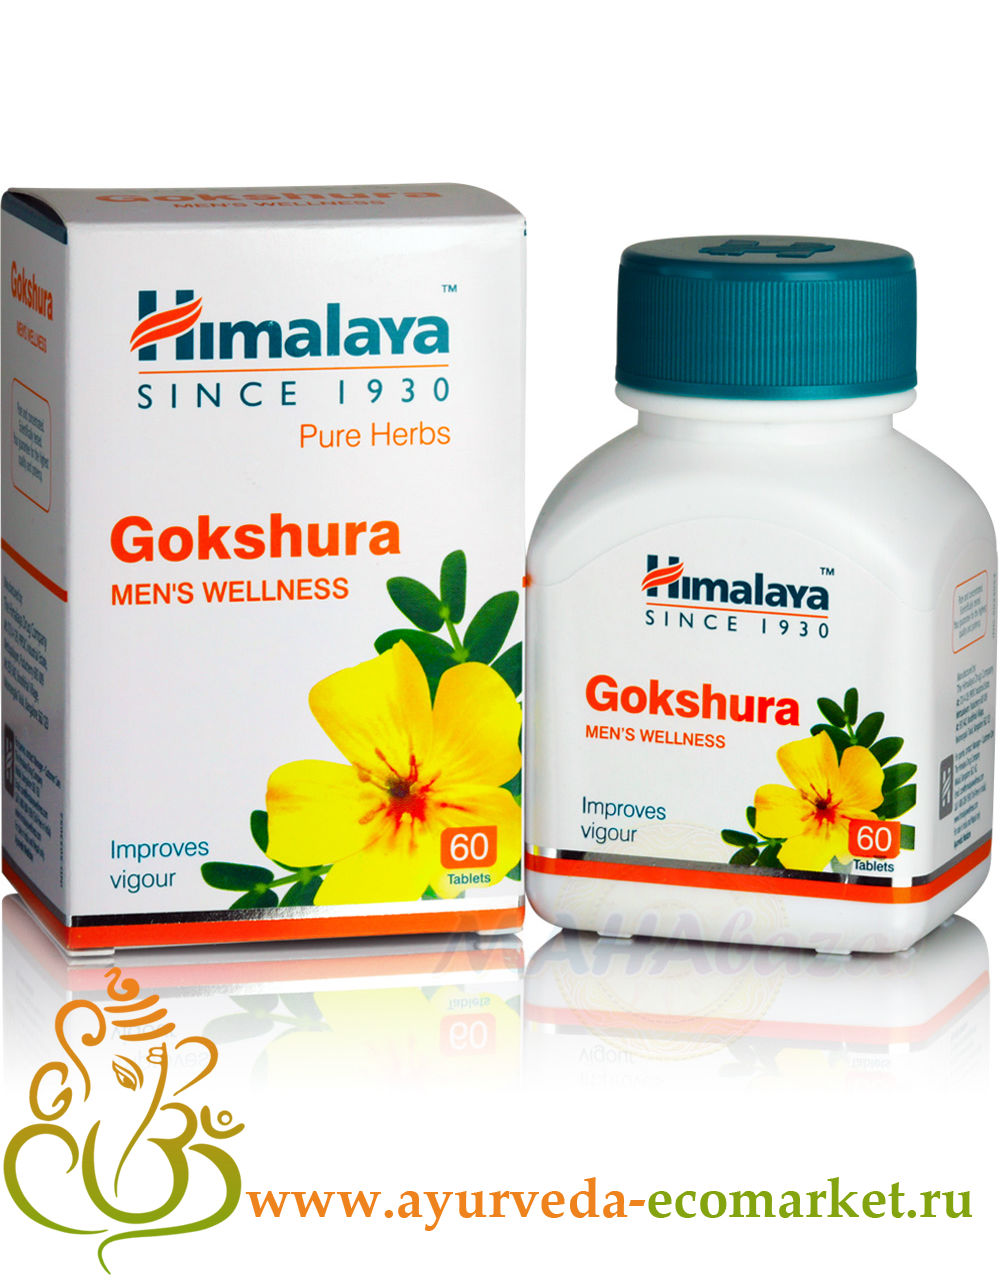 "Фото 7920: Гокшура, 60 таблеток, производитель ""Хималая"", Gokshura, 60 tab. Himalaya"